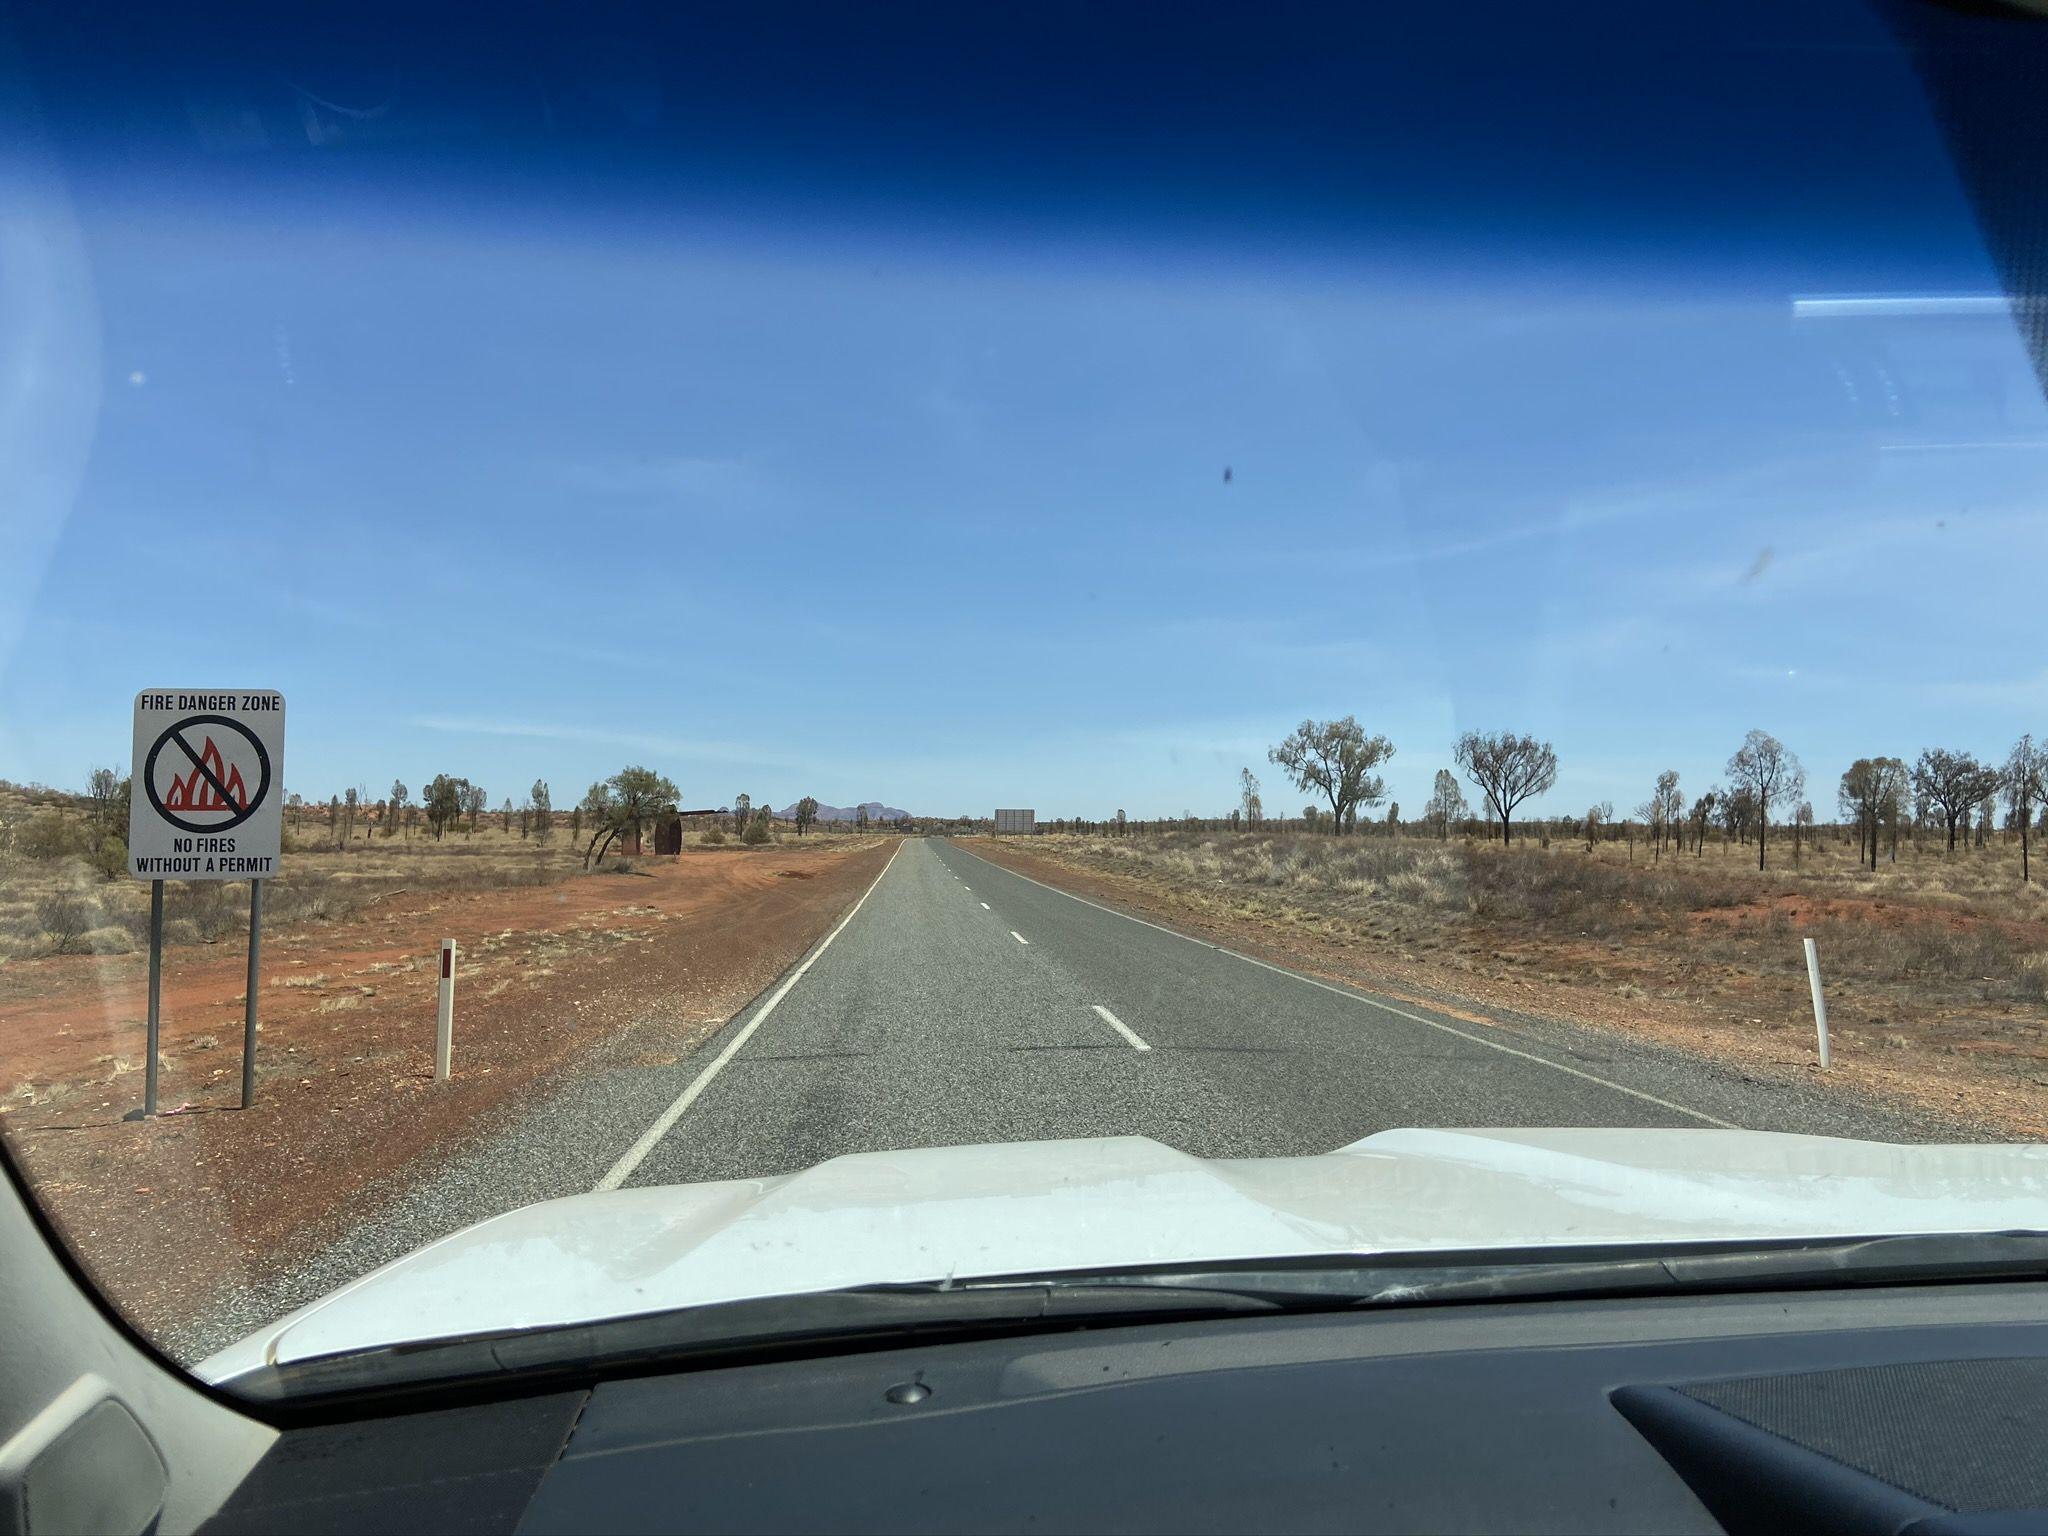 Fahrt Alice Springs nach Ayers Rock